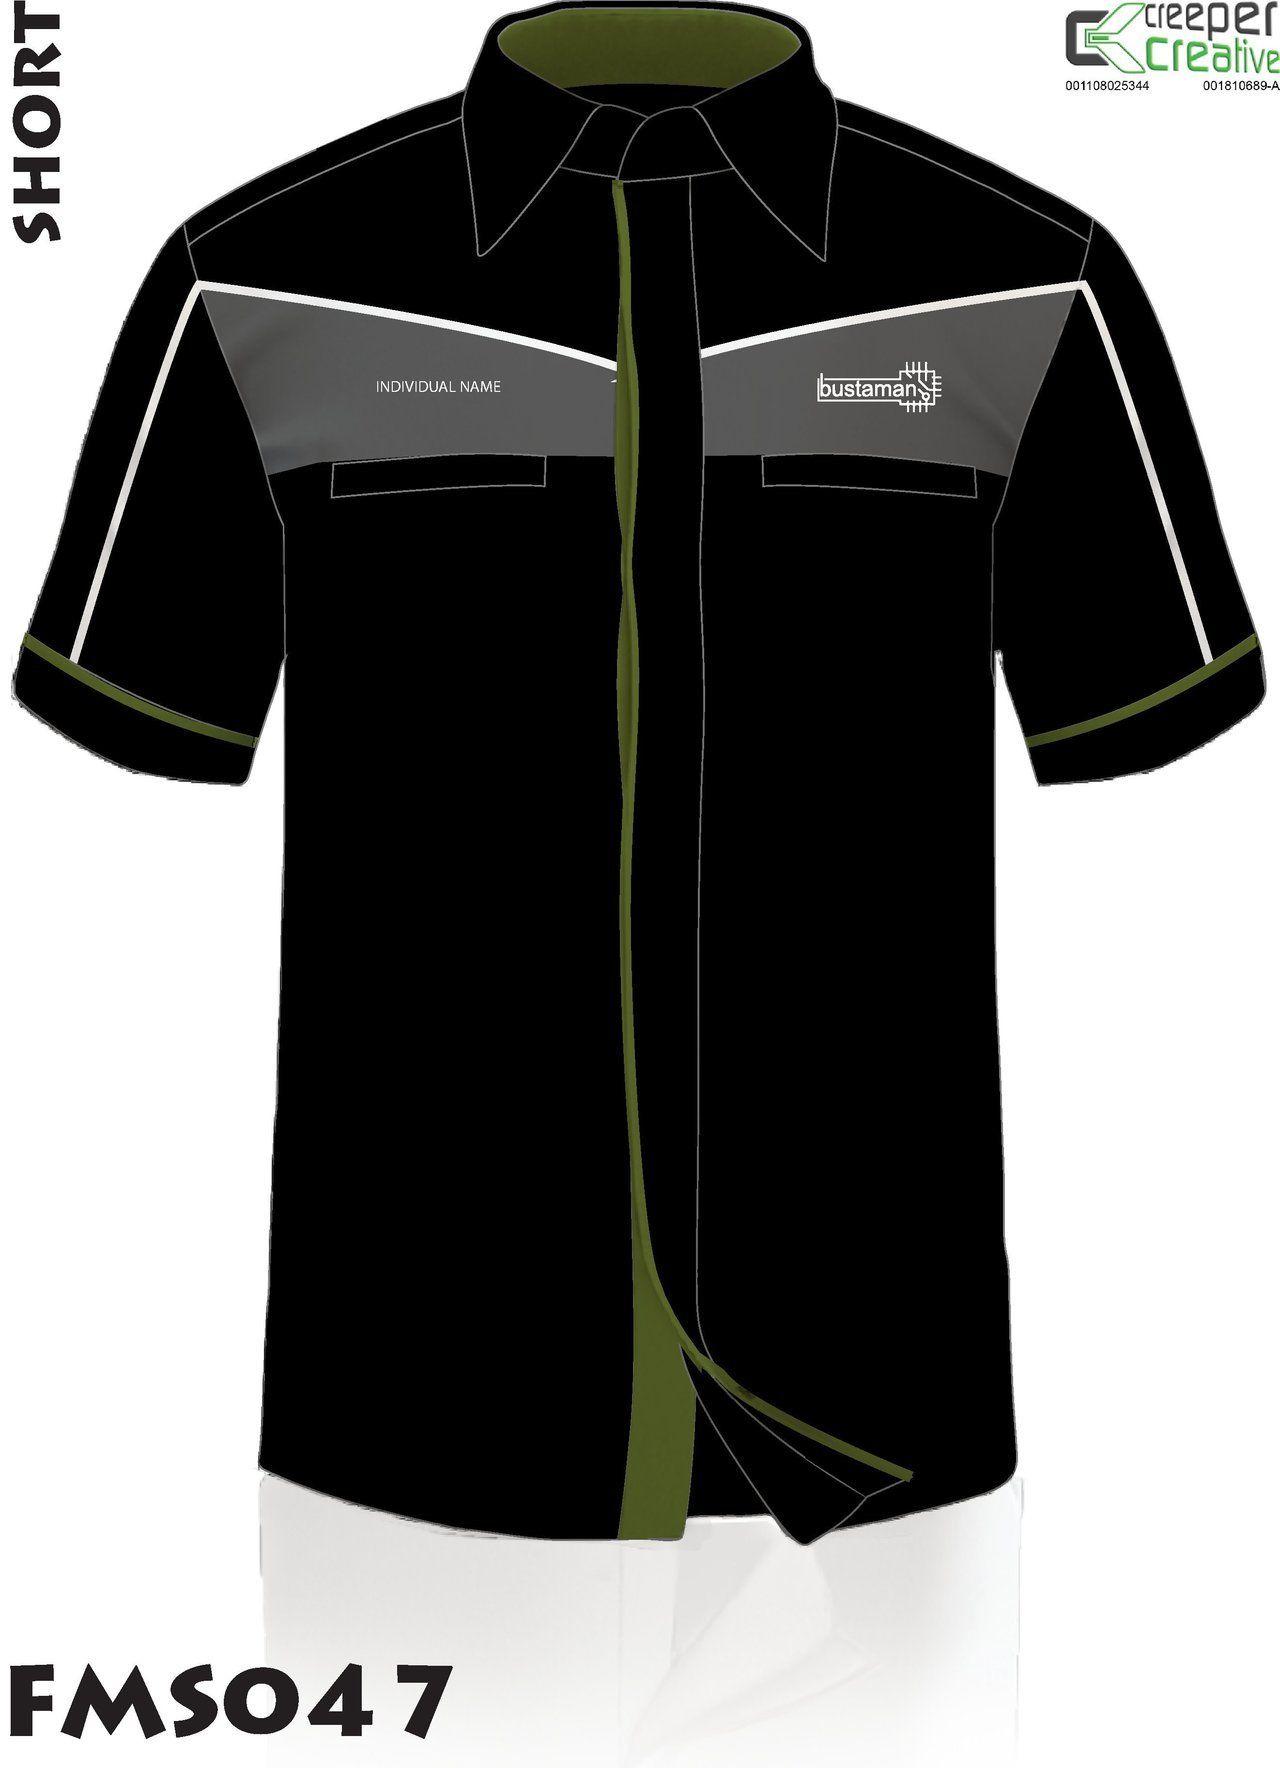 Download Magicaluniform Corporate Shirts Uniform Design Customised Uniform